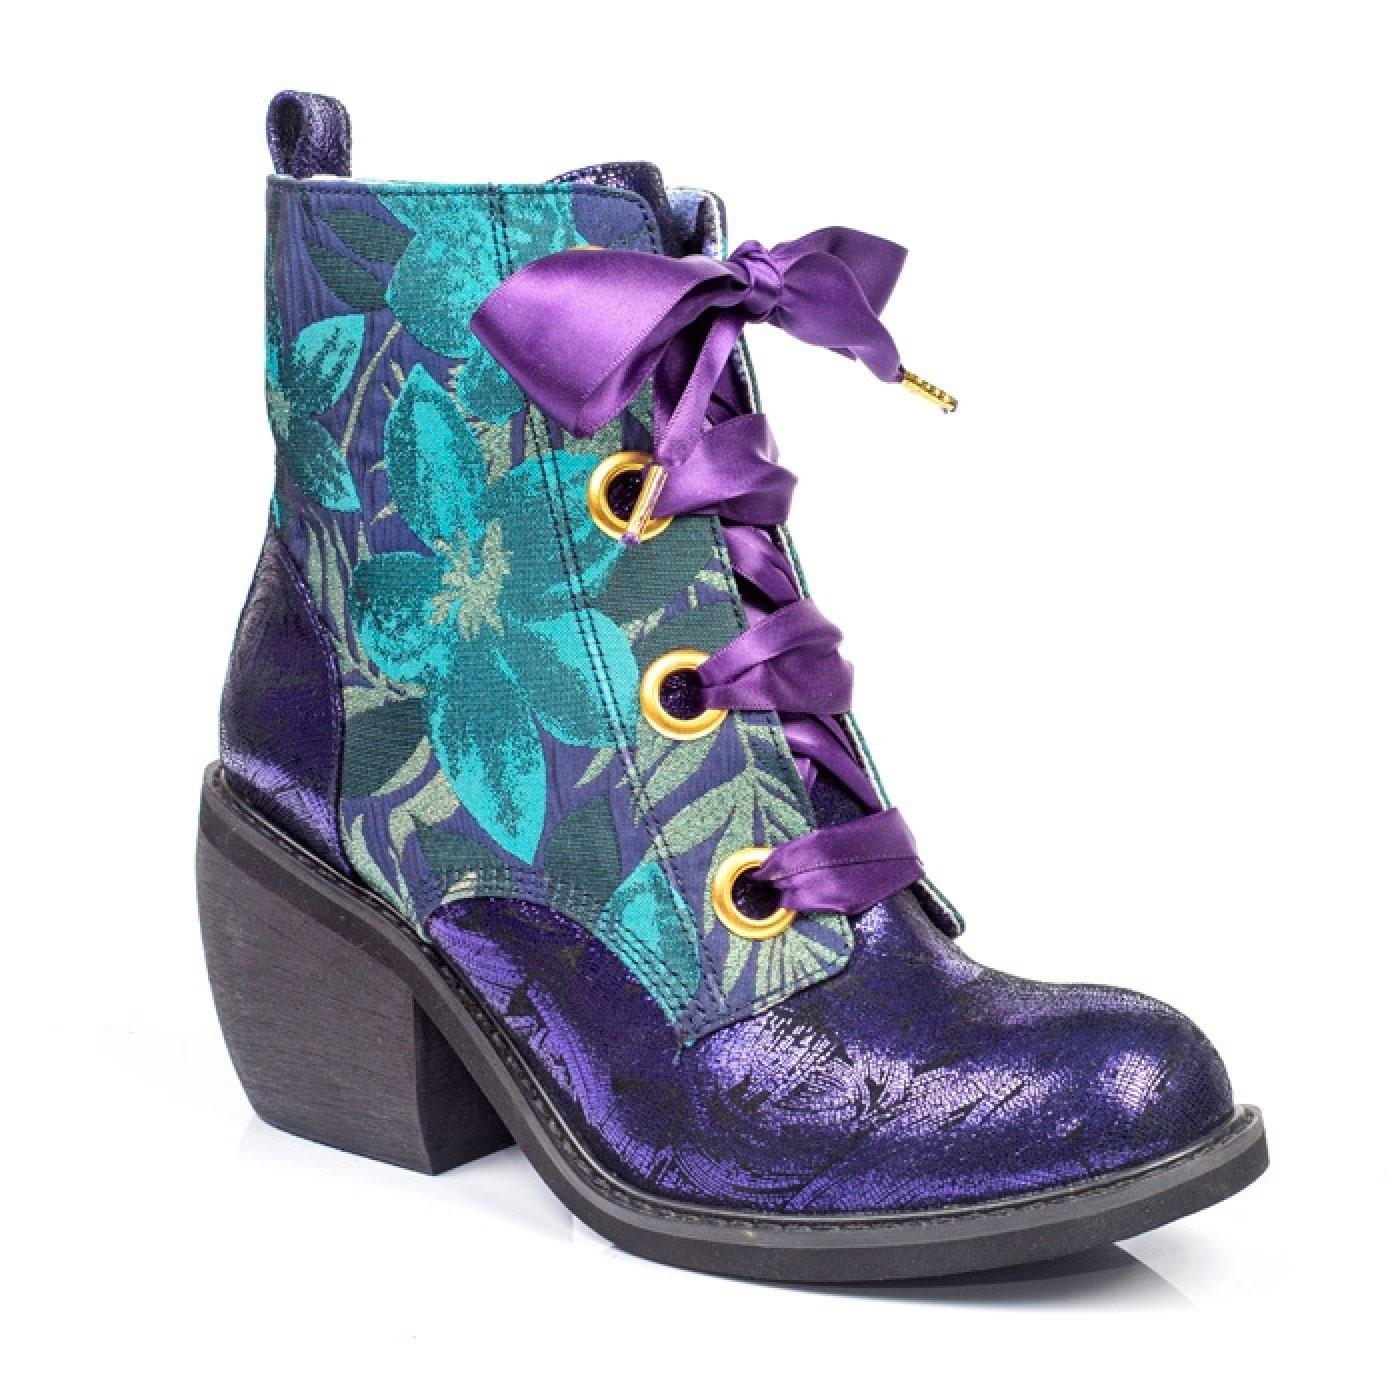 Quick Getaway IRREGULAR CHOICE Vintage Boots V